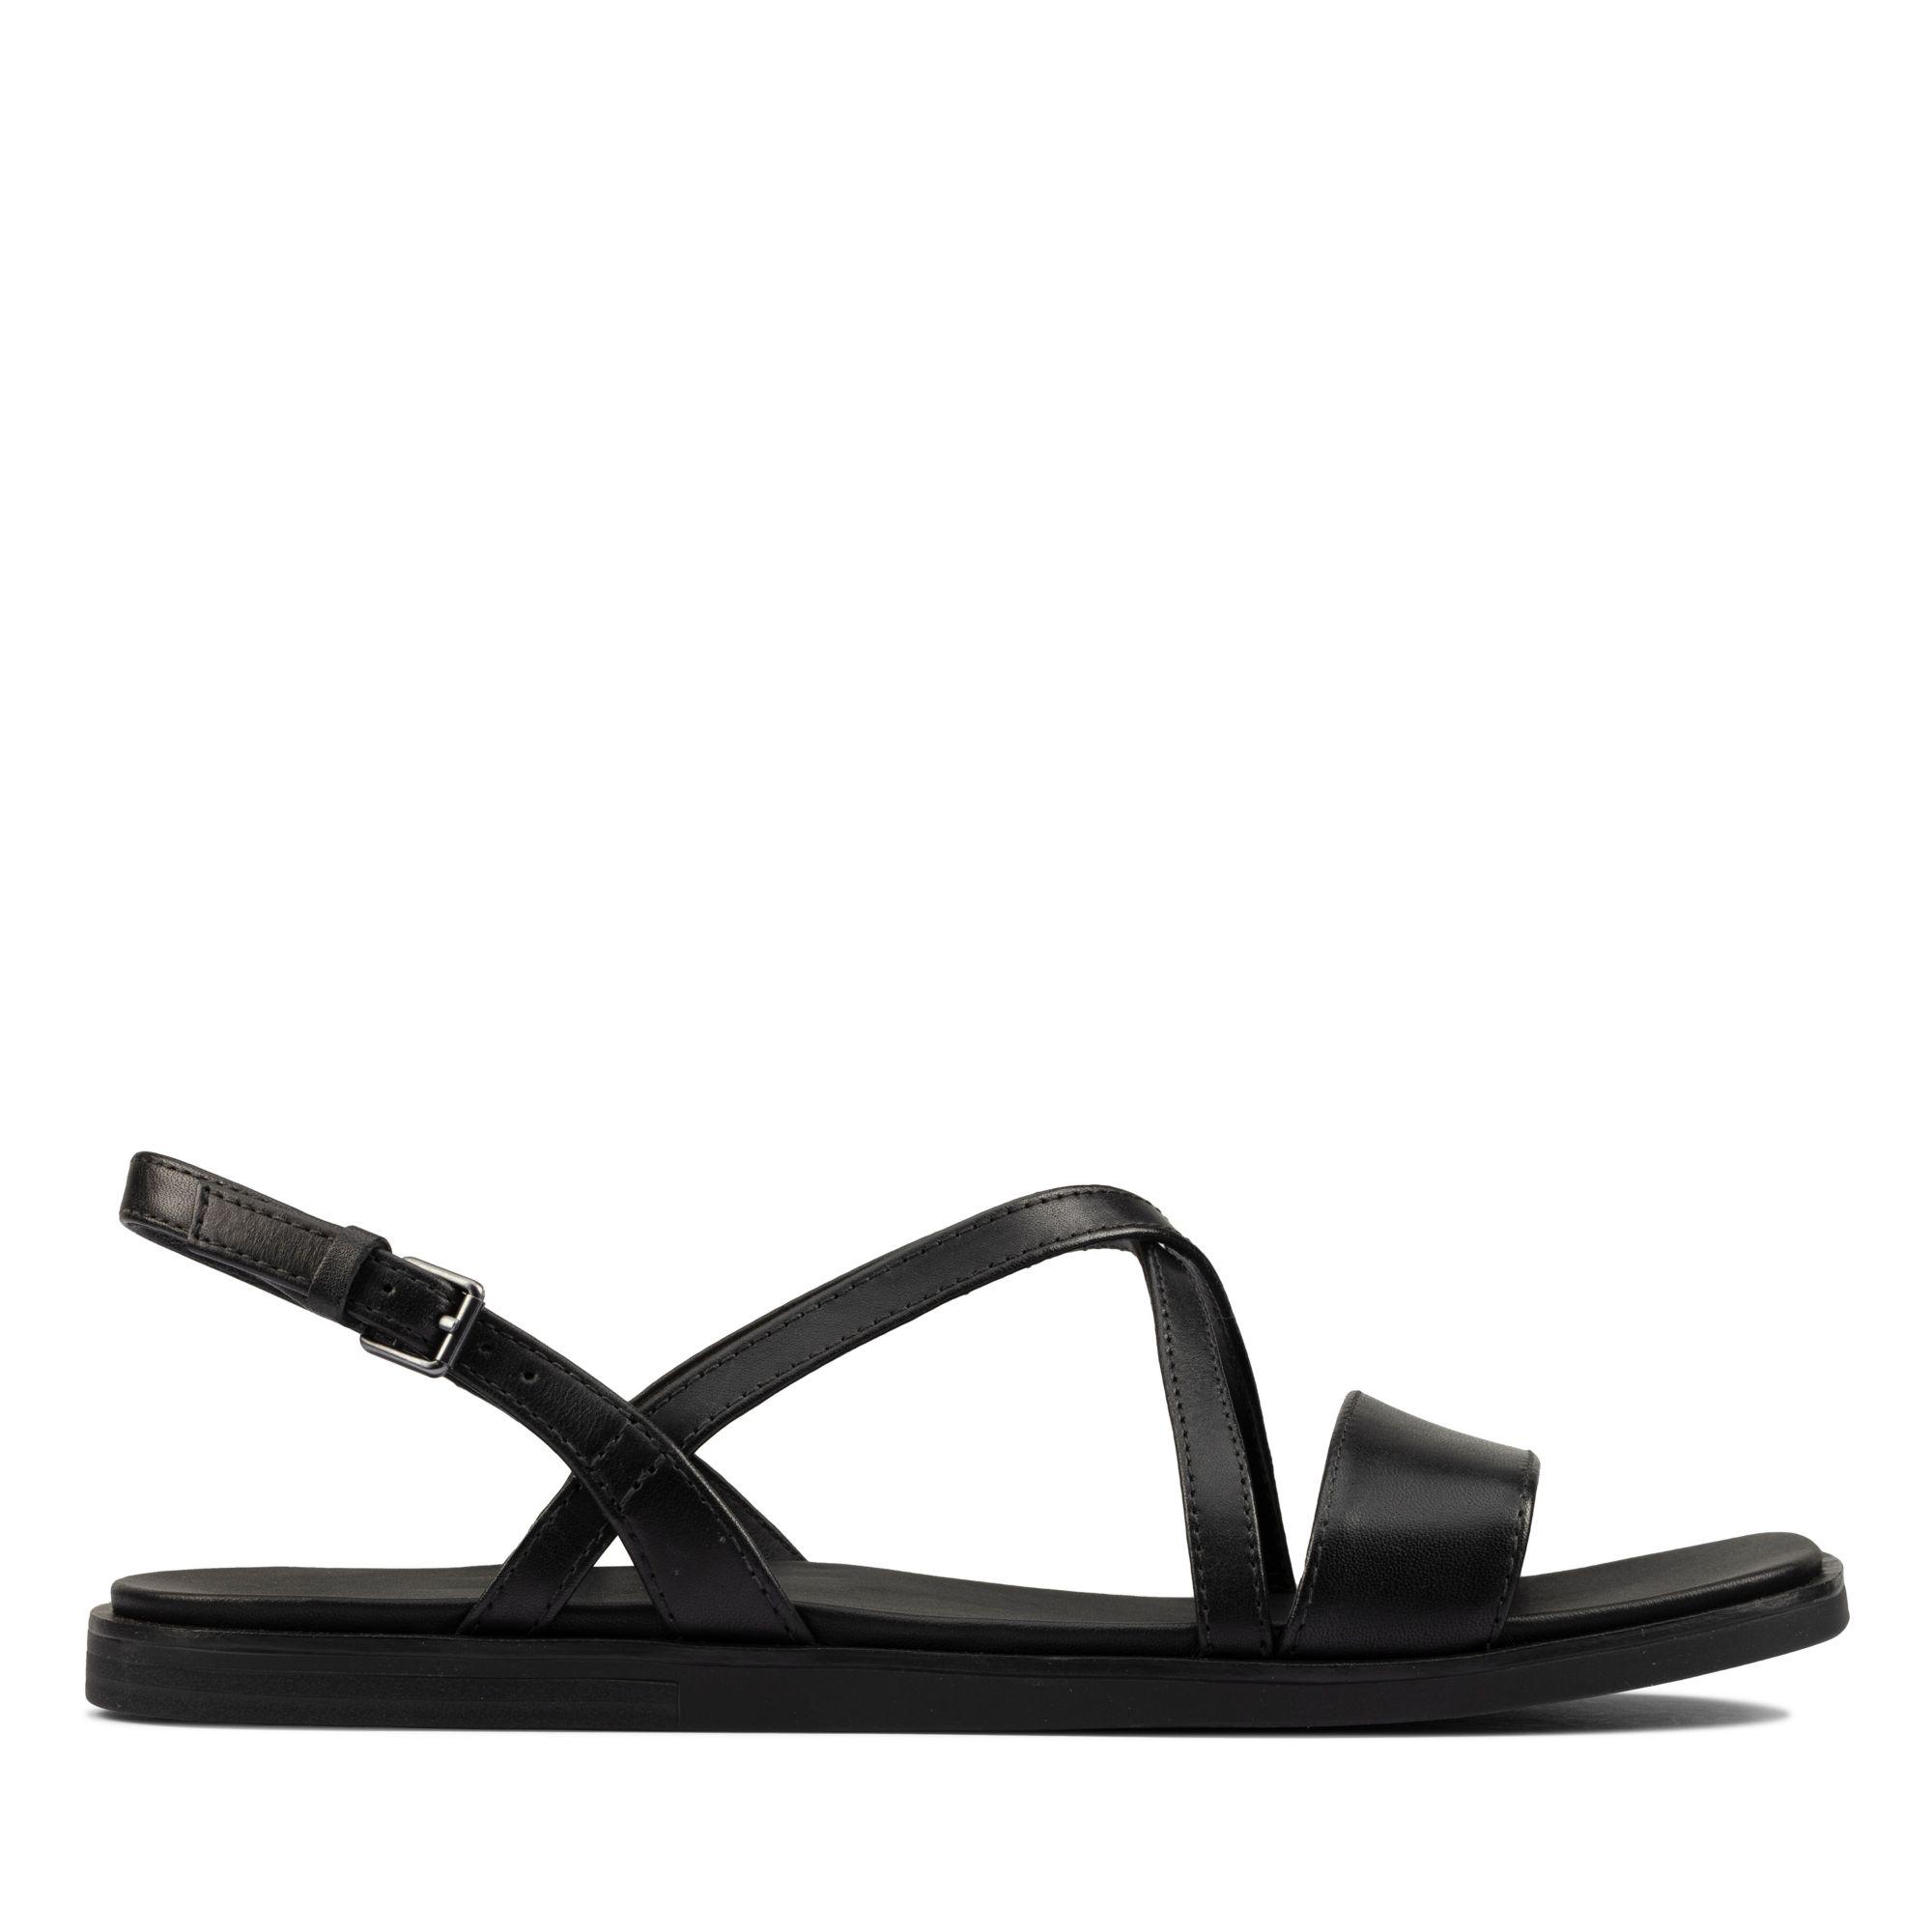 Clarks瀲灩之夏-Ofra Strap細帶交織真皮低跟涼鞋(黑色)